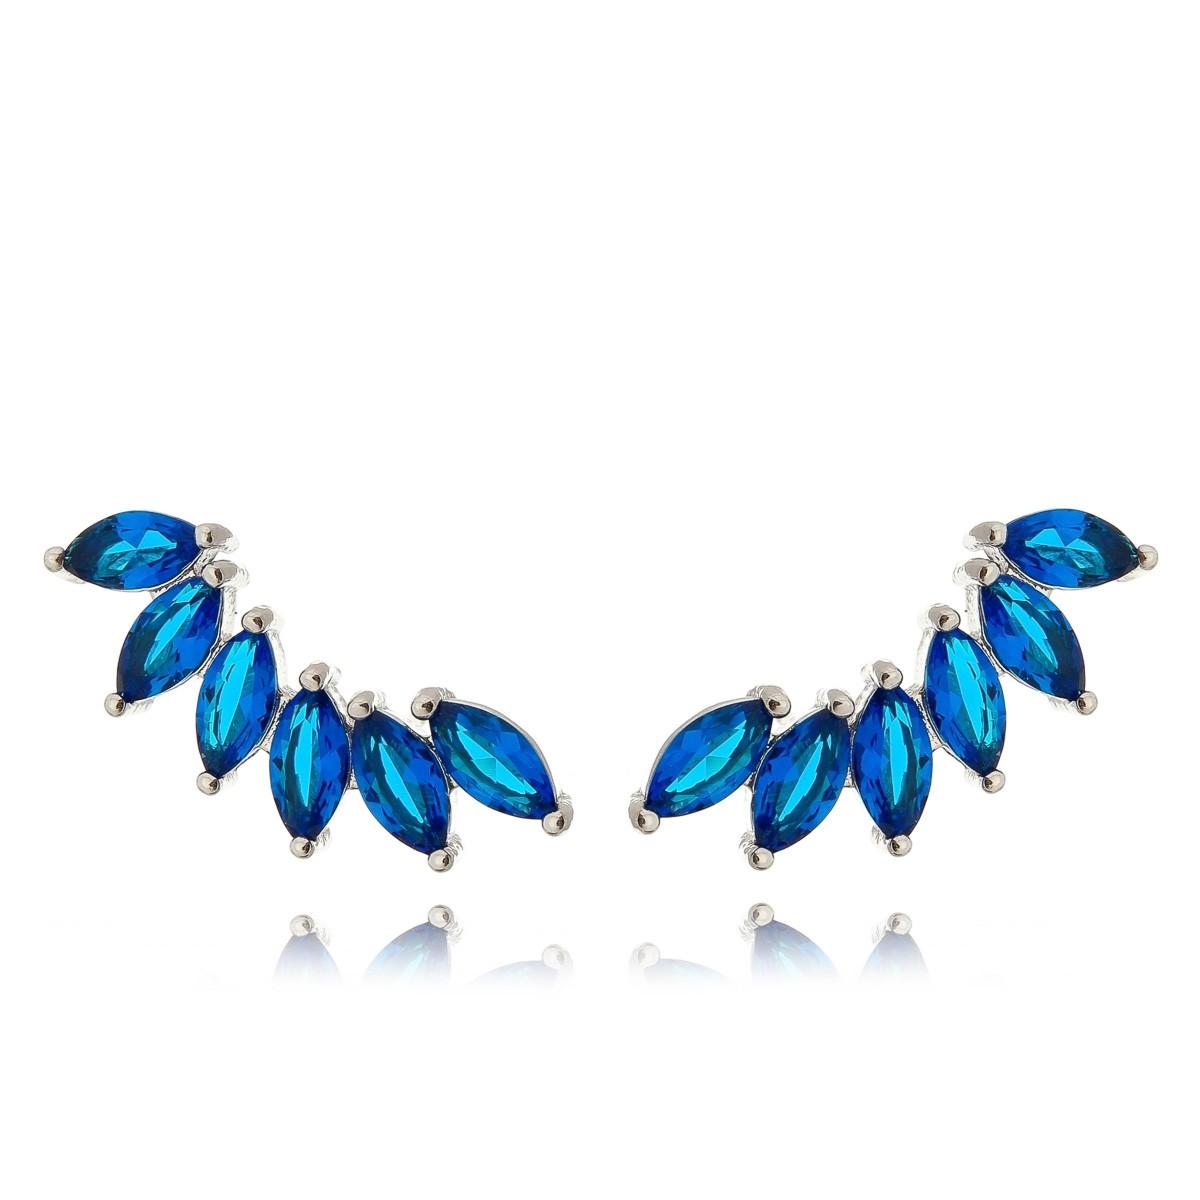 Ear Cuff Azul Safira Semijoia em Ródio Branco com Zircônia  - Soloyou